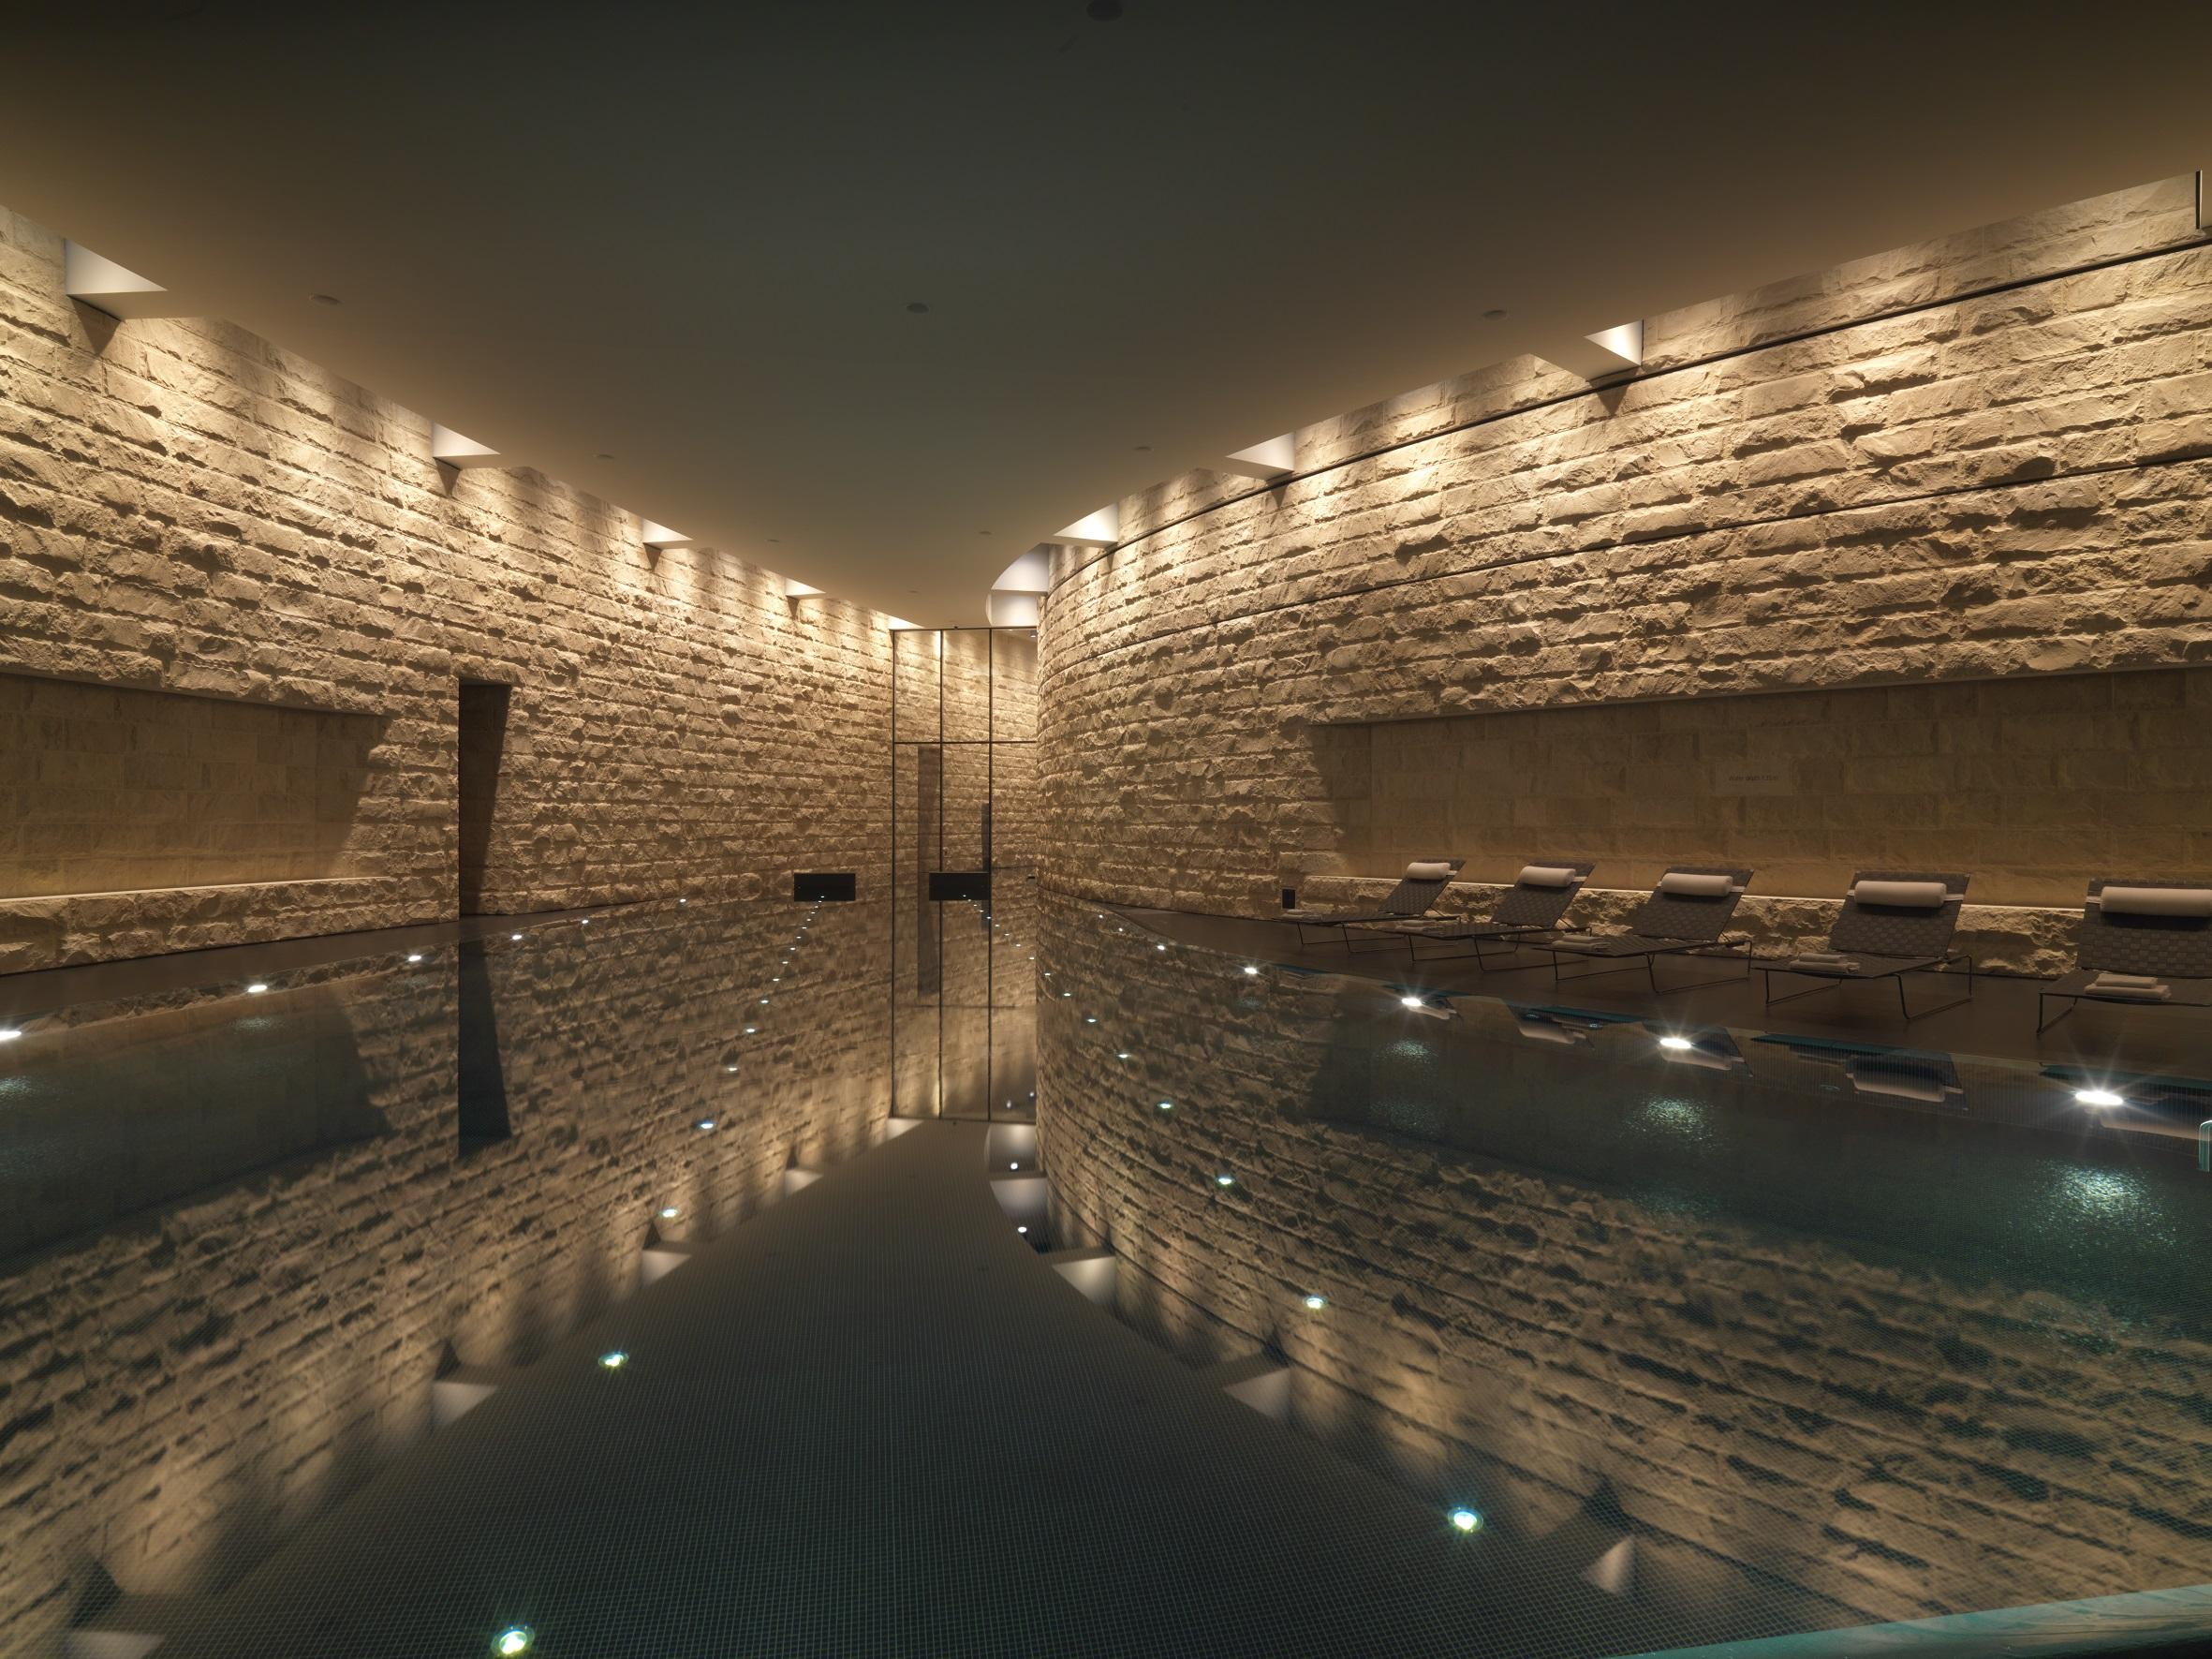 Indoor pool in the Dolder Grand hotel